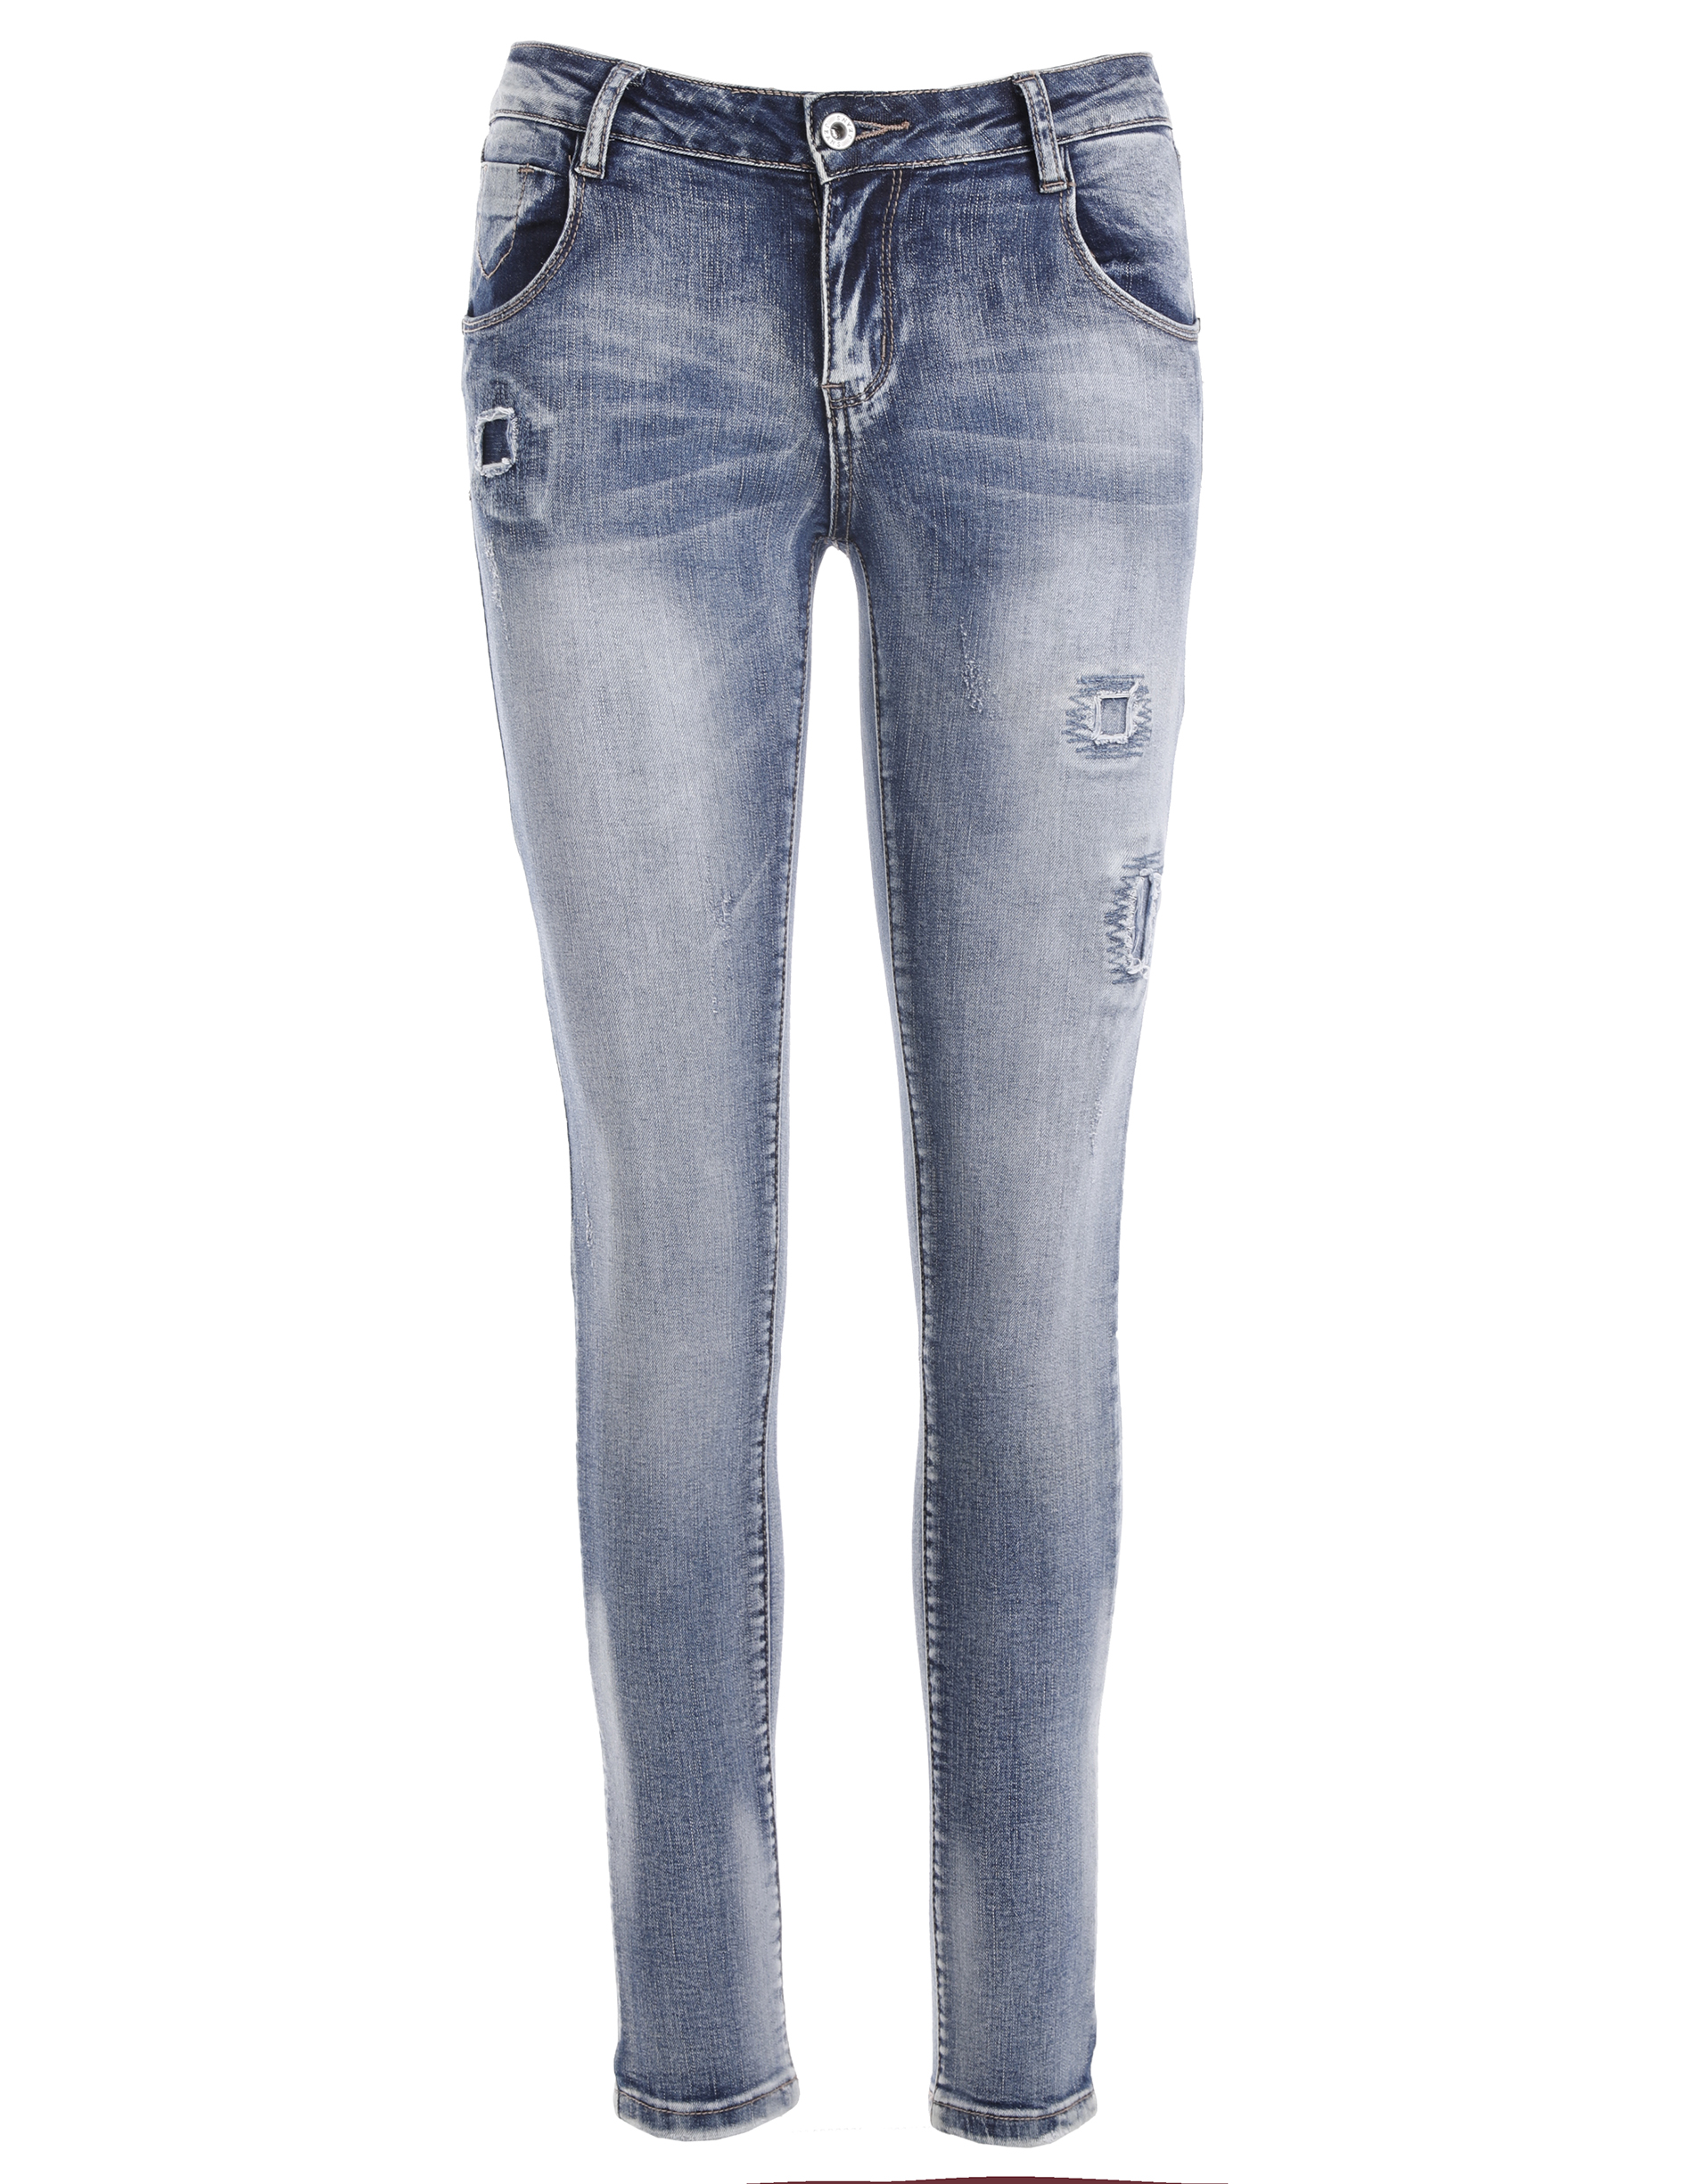 Spodnie - 154-S5020 JEA - Unisono